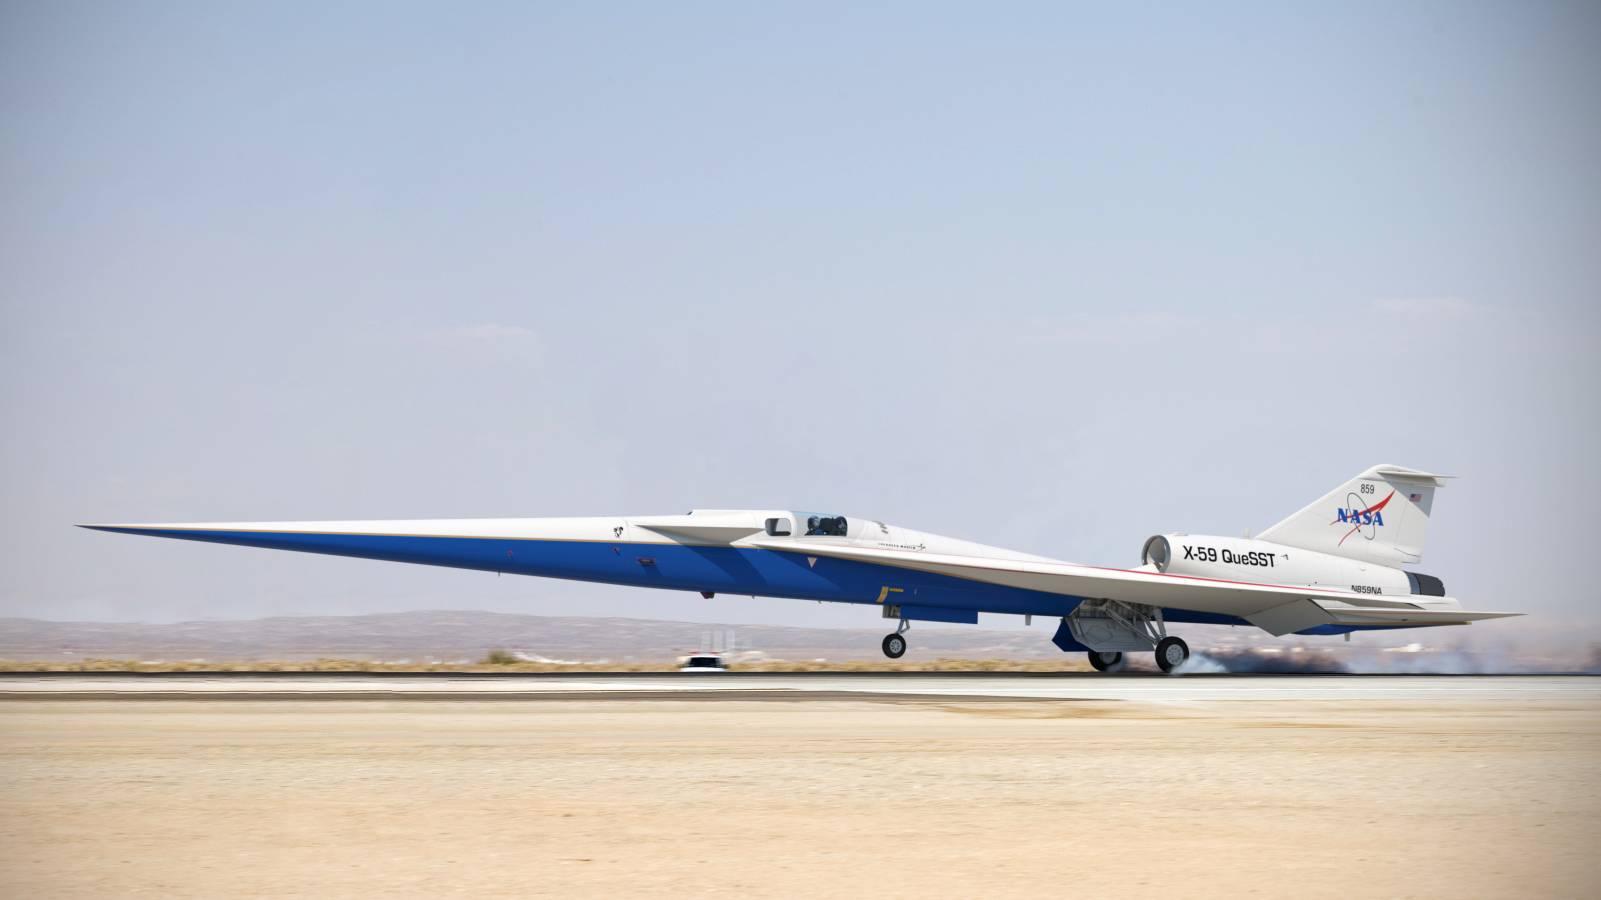 NASA avion supersonic